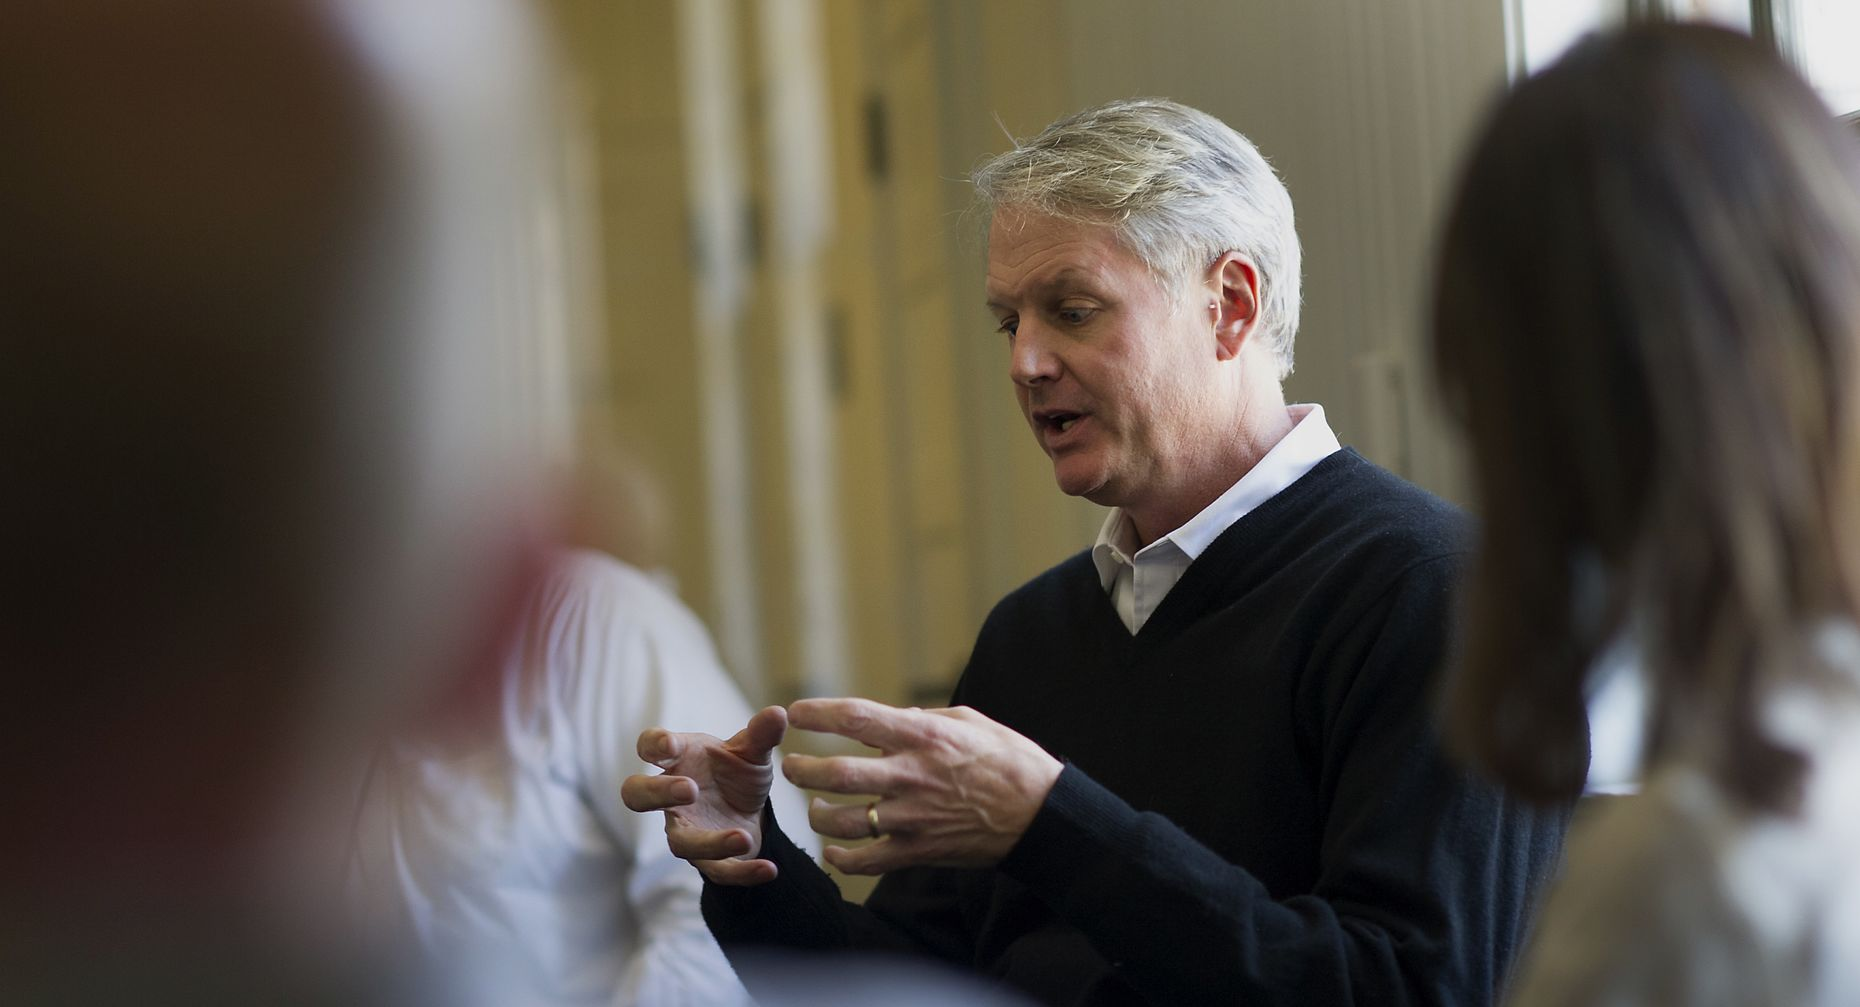 eBay CEO John Donahoe. Photo by Bloomberg.